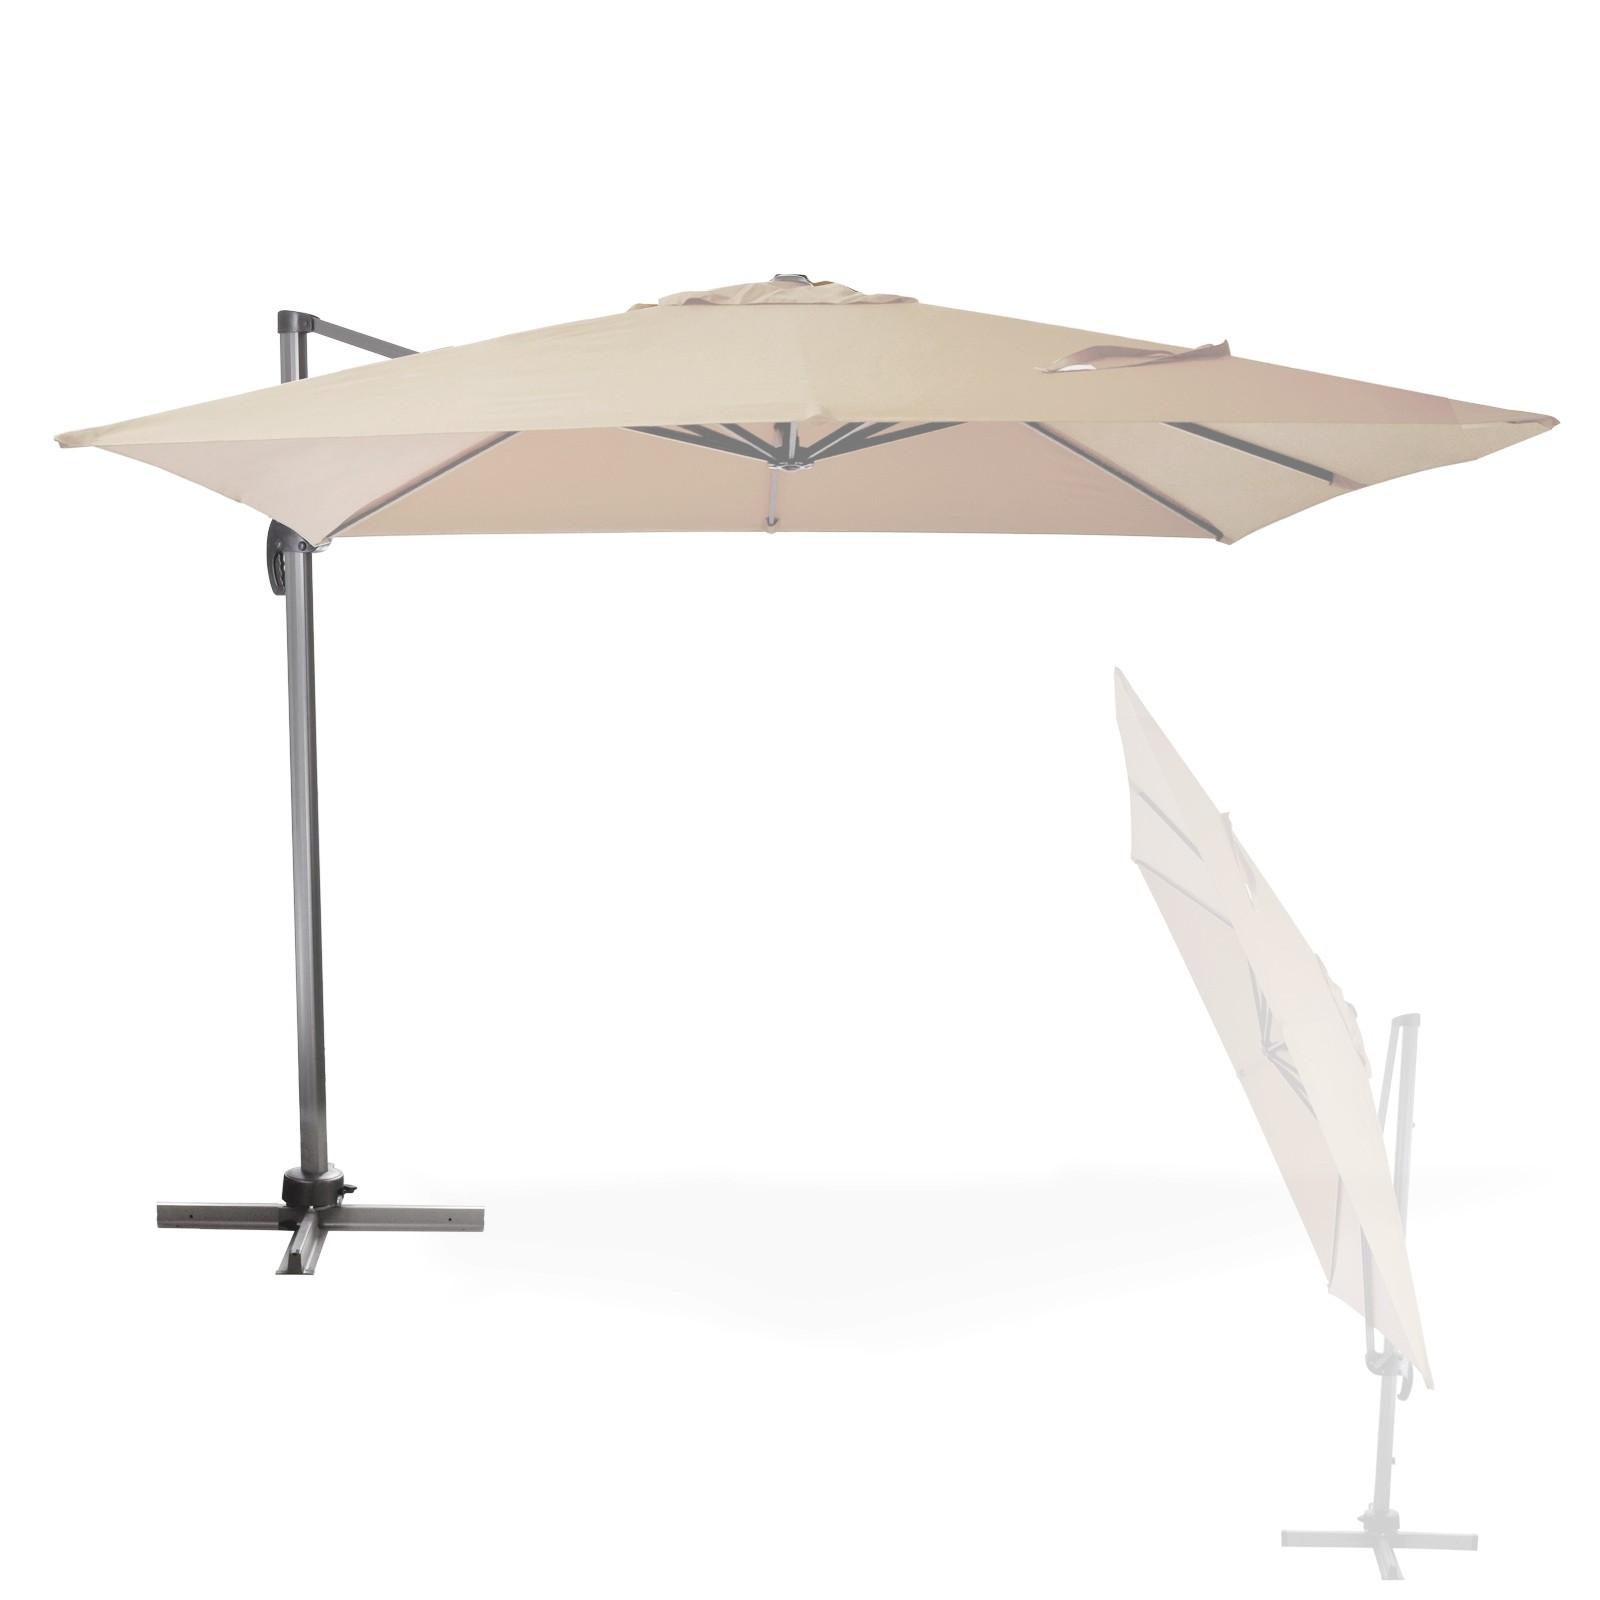 Dema Ampelschirm / Sonnenschirm Verona 3 x 3 m - Farbe nach Wahl var-ampelschirm-verona